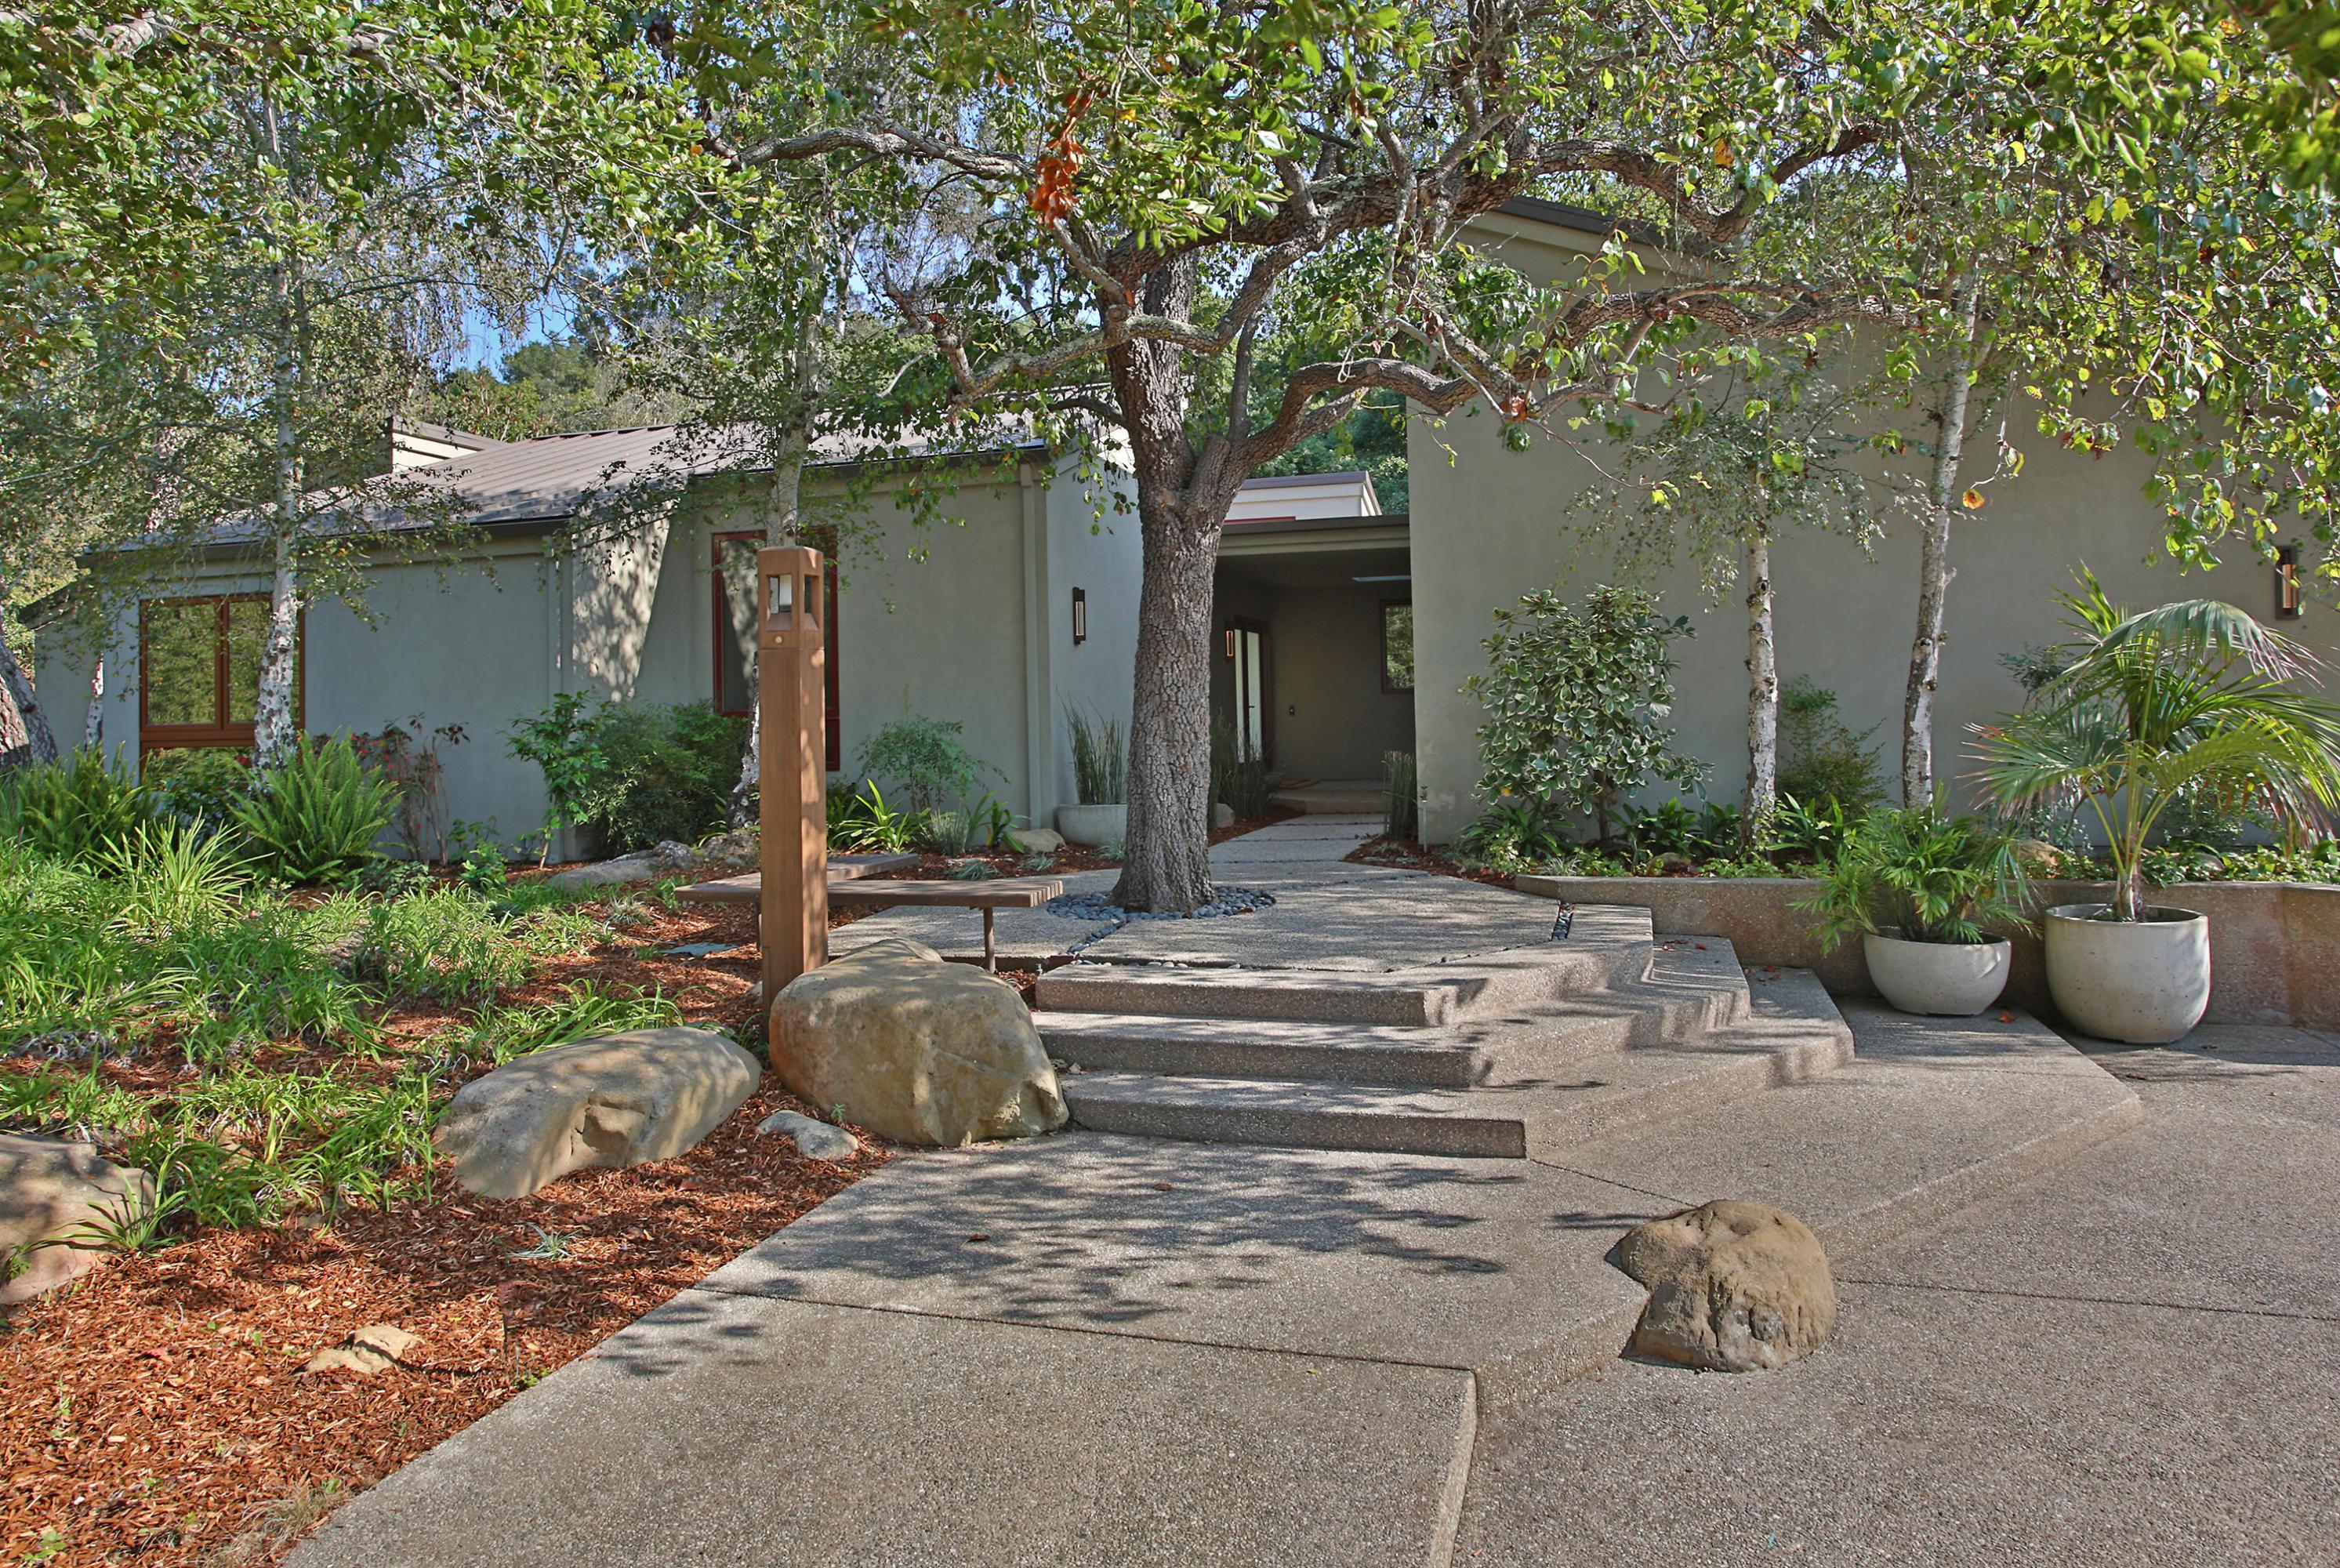 Property photo for 1053 Camino Viejo Montecito, California 93108 - 15-107